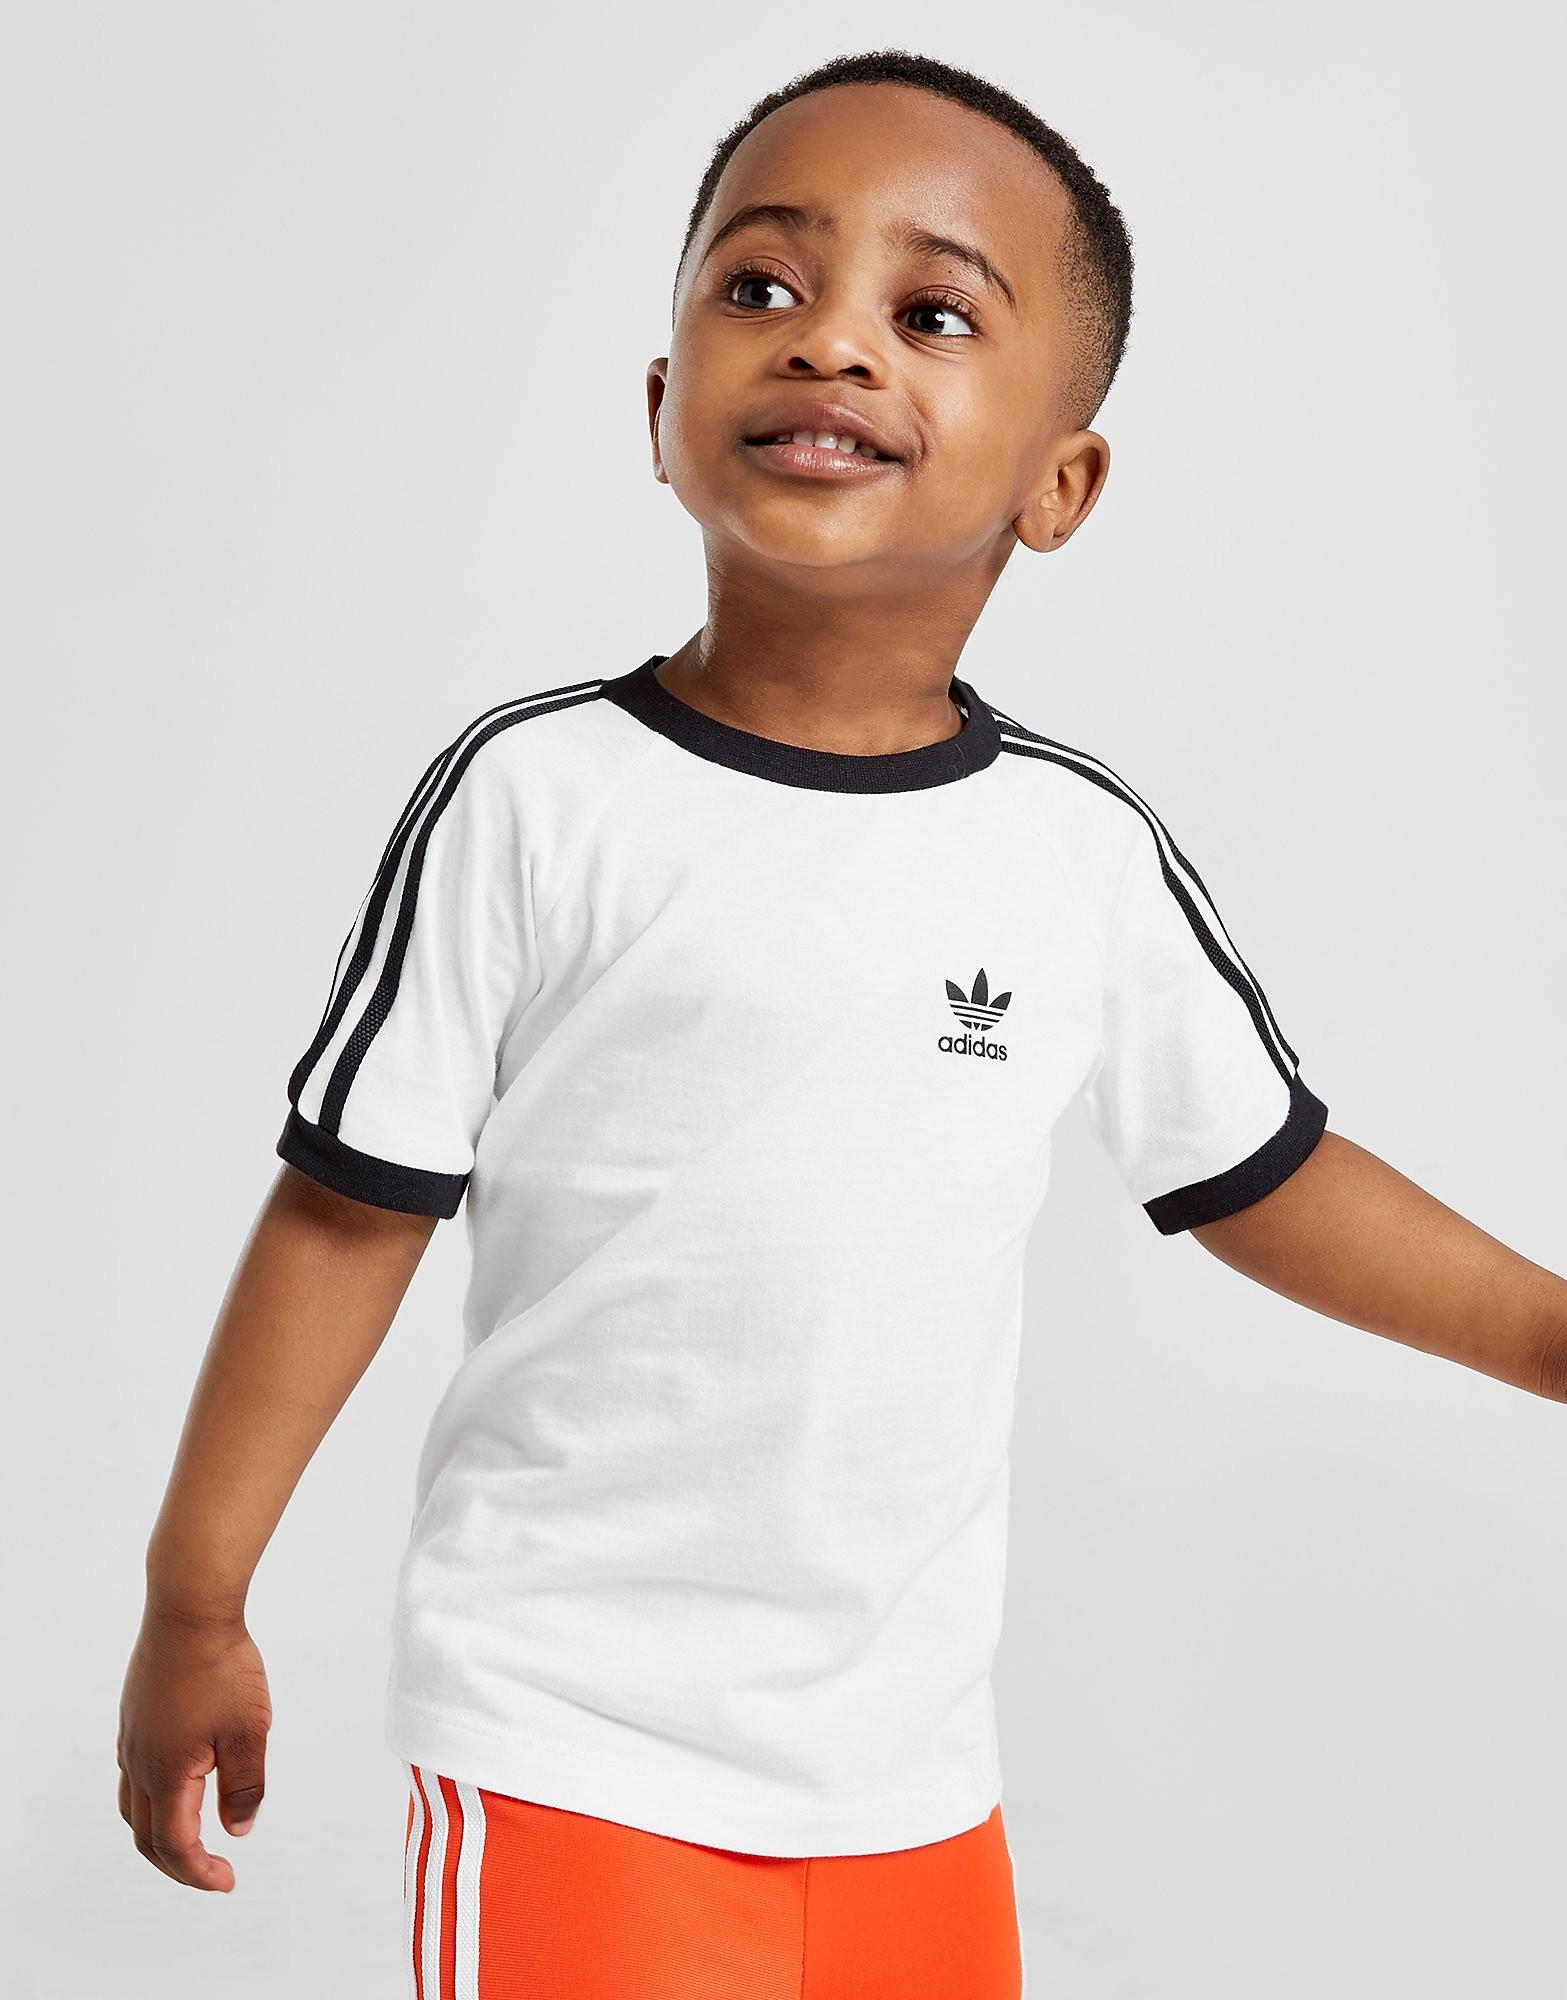 adidas Originals California T-Shirt Infant - Wit - Kind